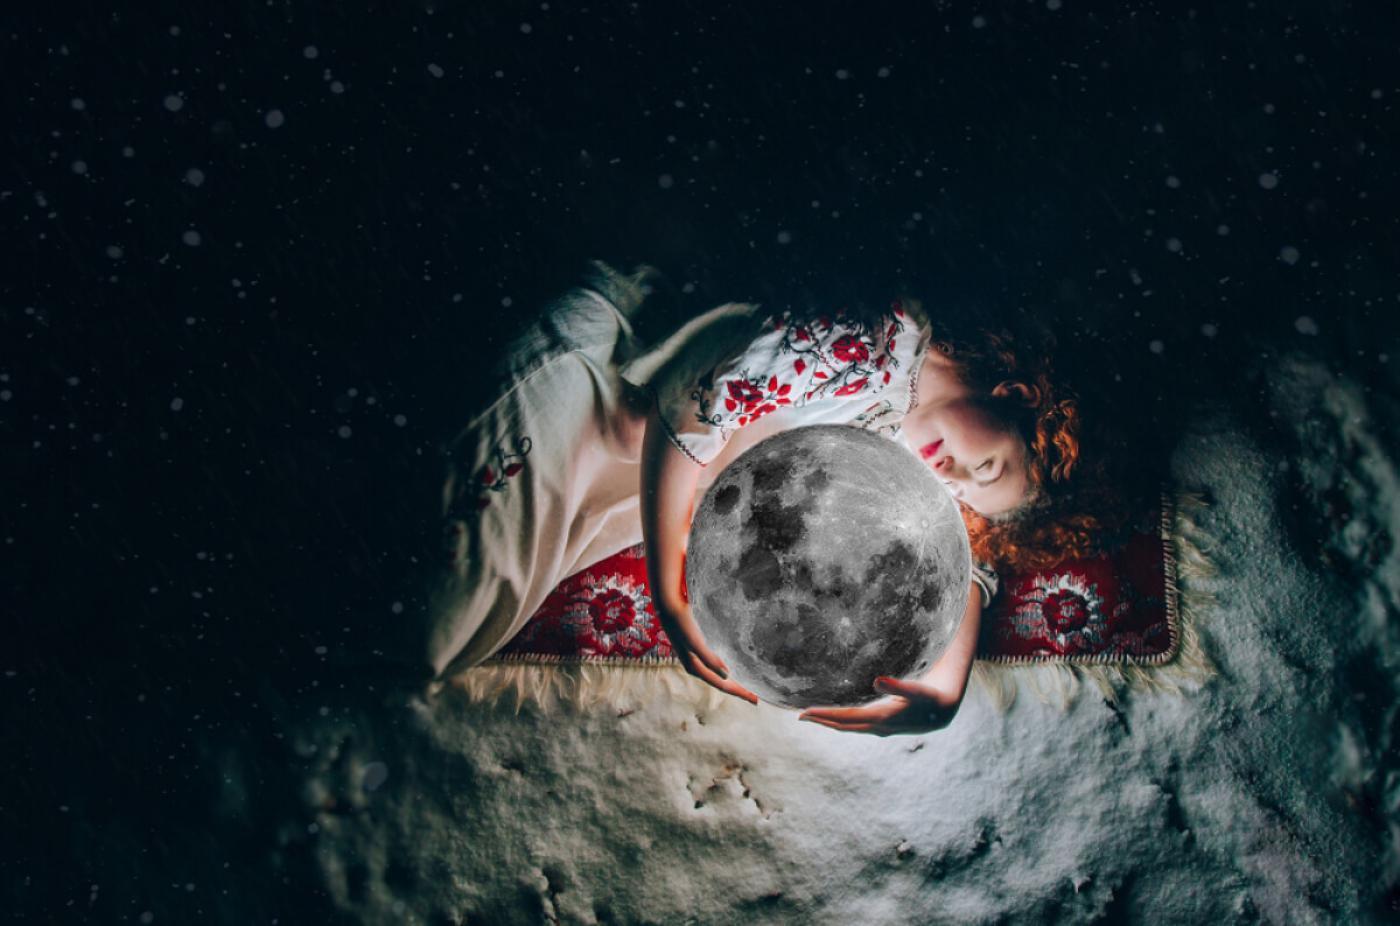 Szűz újhold